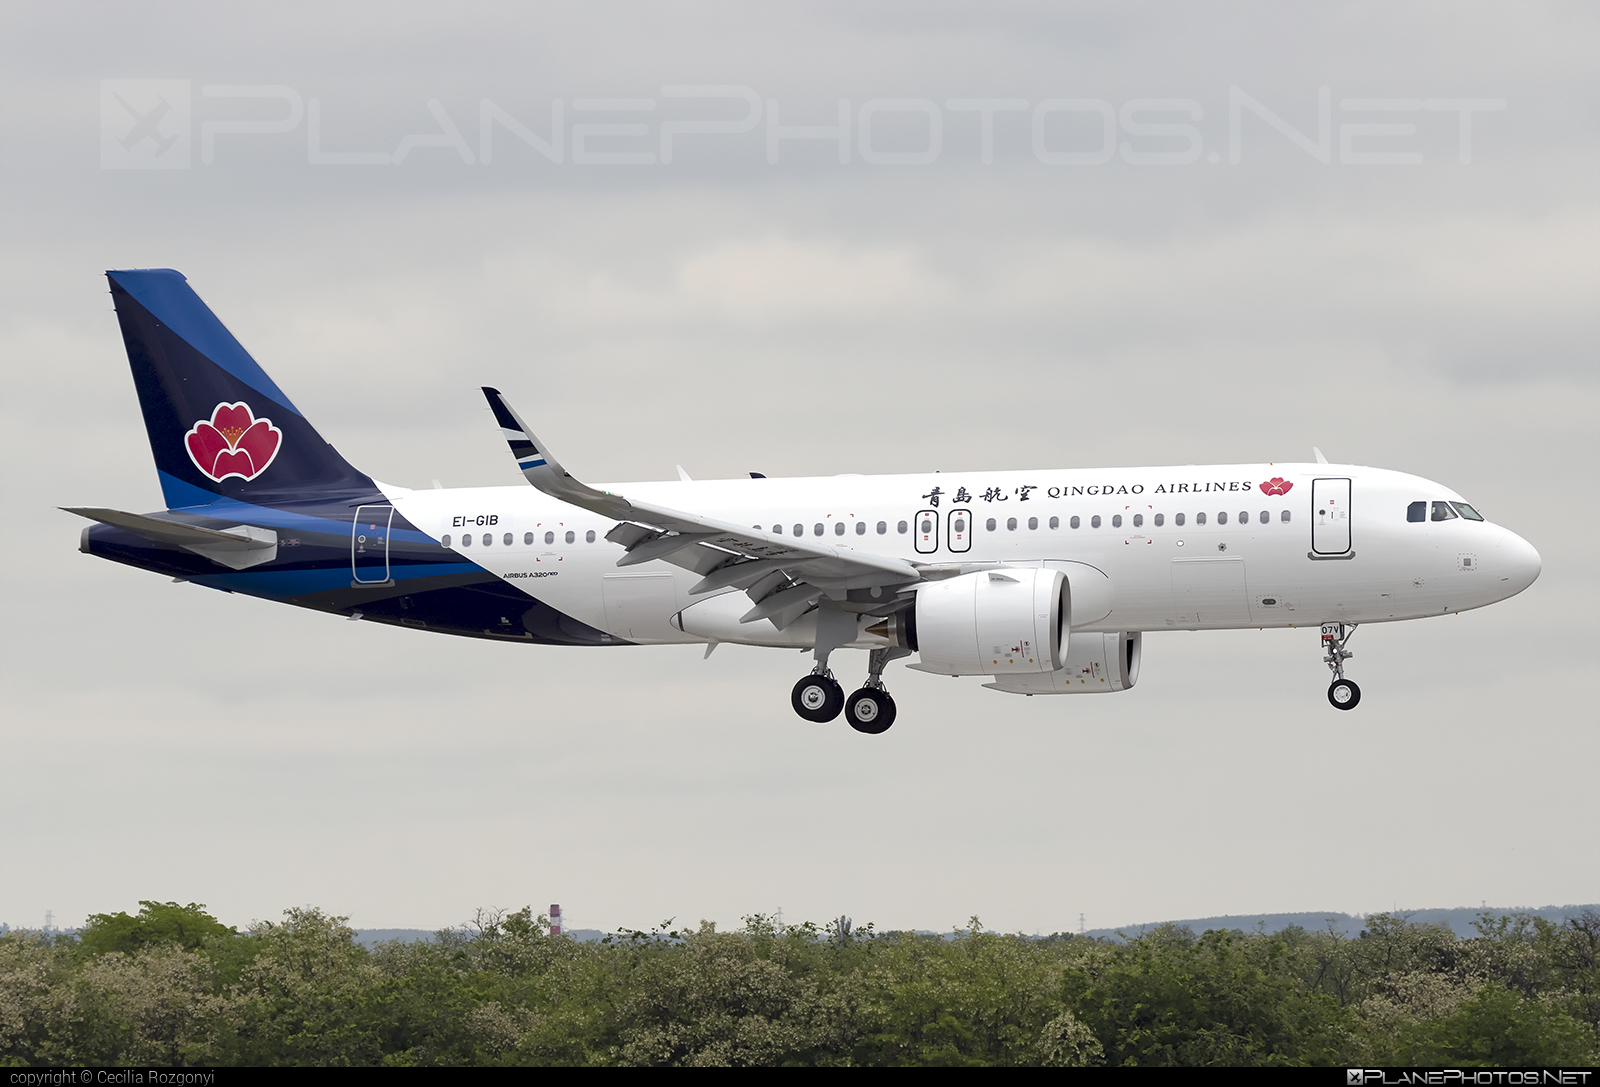 Qingdao Airlines Airbus A320-271N - EI-GIB #a320 #a320family #a320neo #airbus #airbus320 #qingdaoairlines